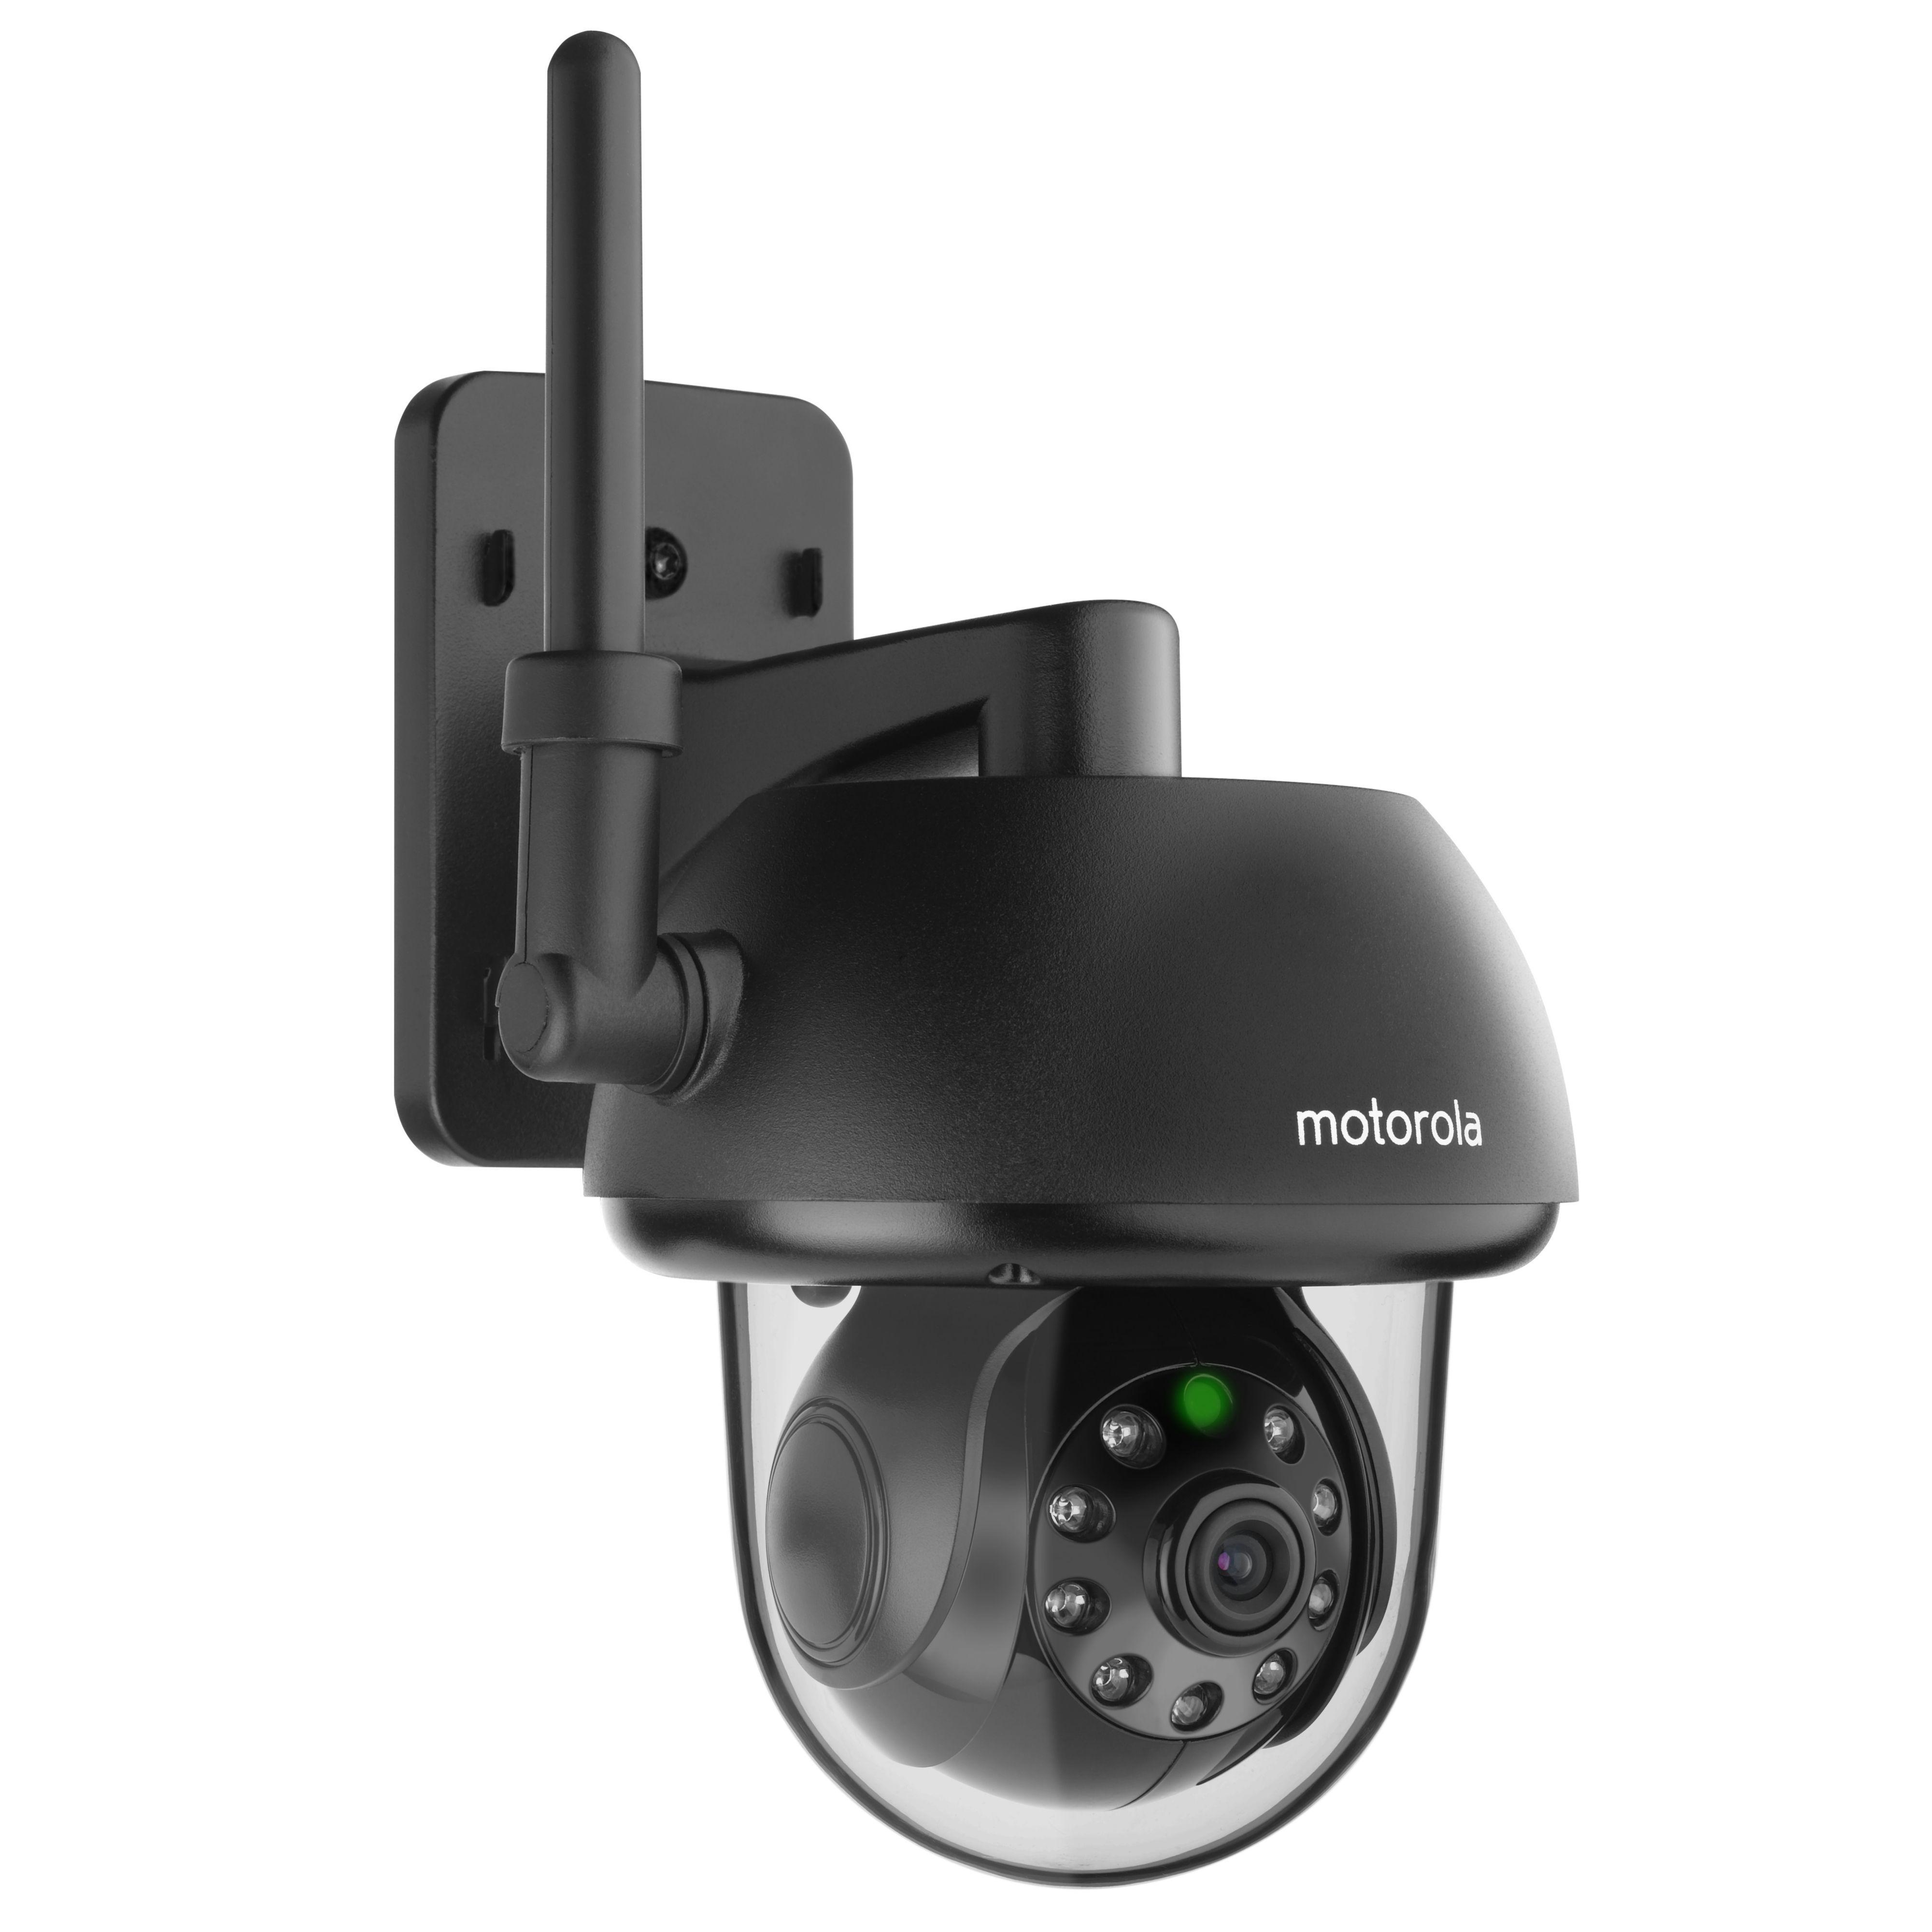 motorola focus 73 wi fi home security camera departments. Black Bedroom Furniture Sets. Home Design Ideas